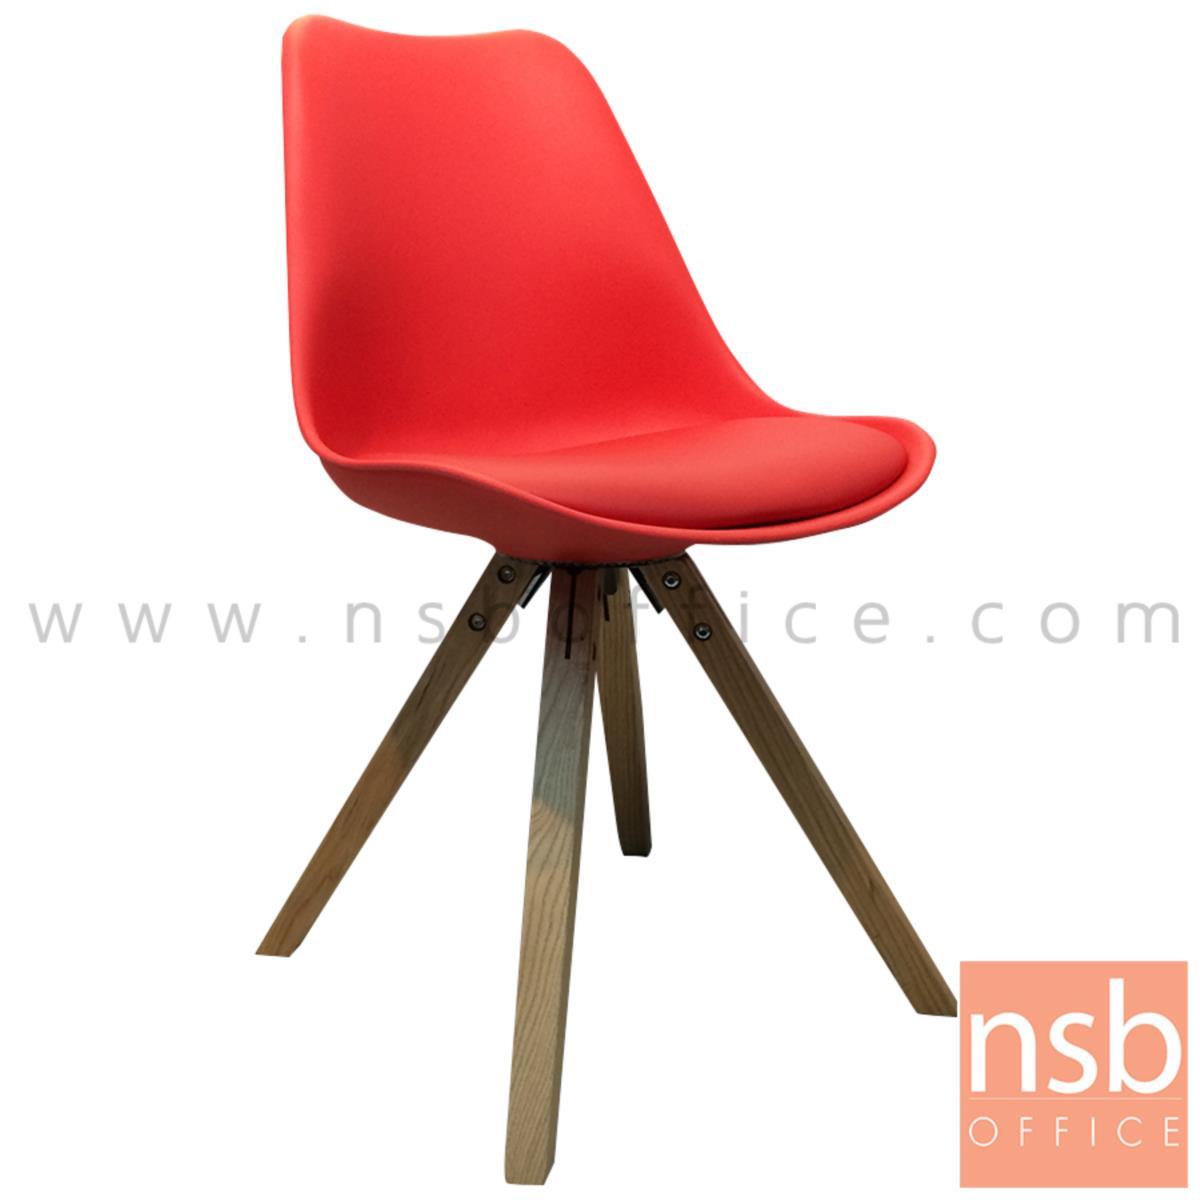 B29A219:เก้าอี้โมเดิร์นหนังเทียม รุ่น Corbin (คอร์บิน) ขนาด 47W cm. ขาไม้